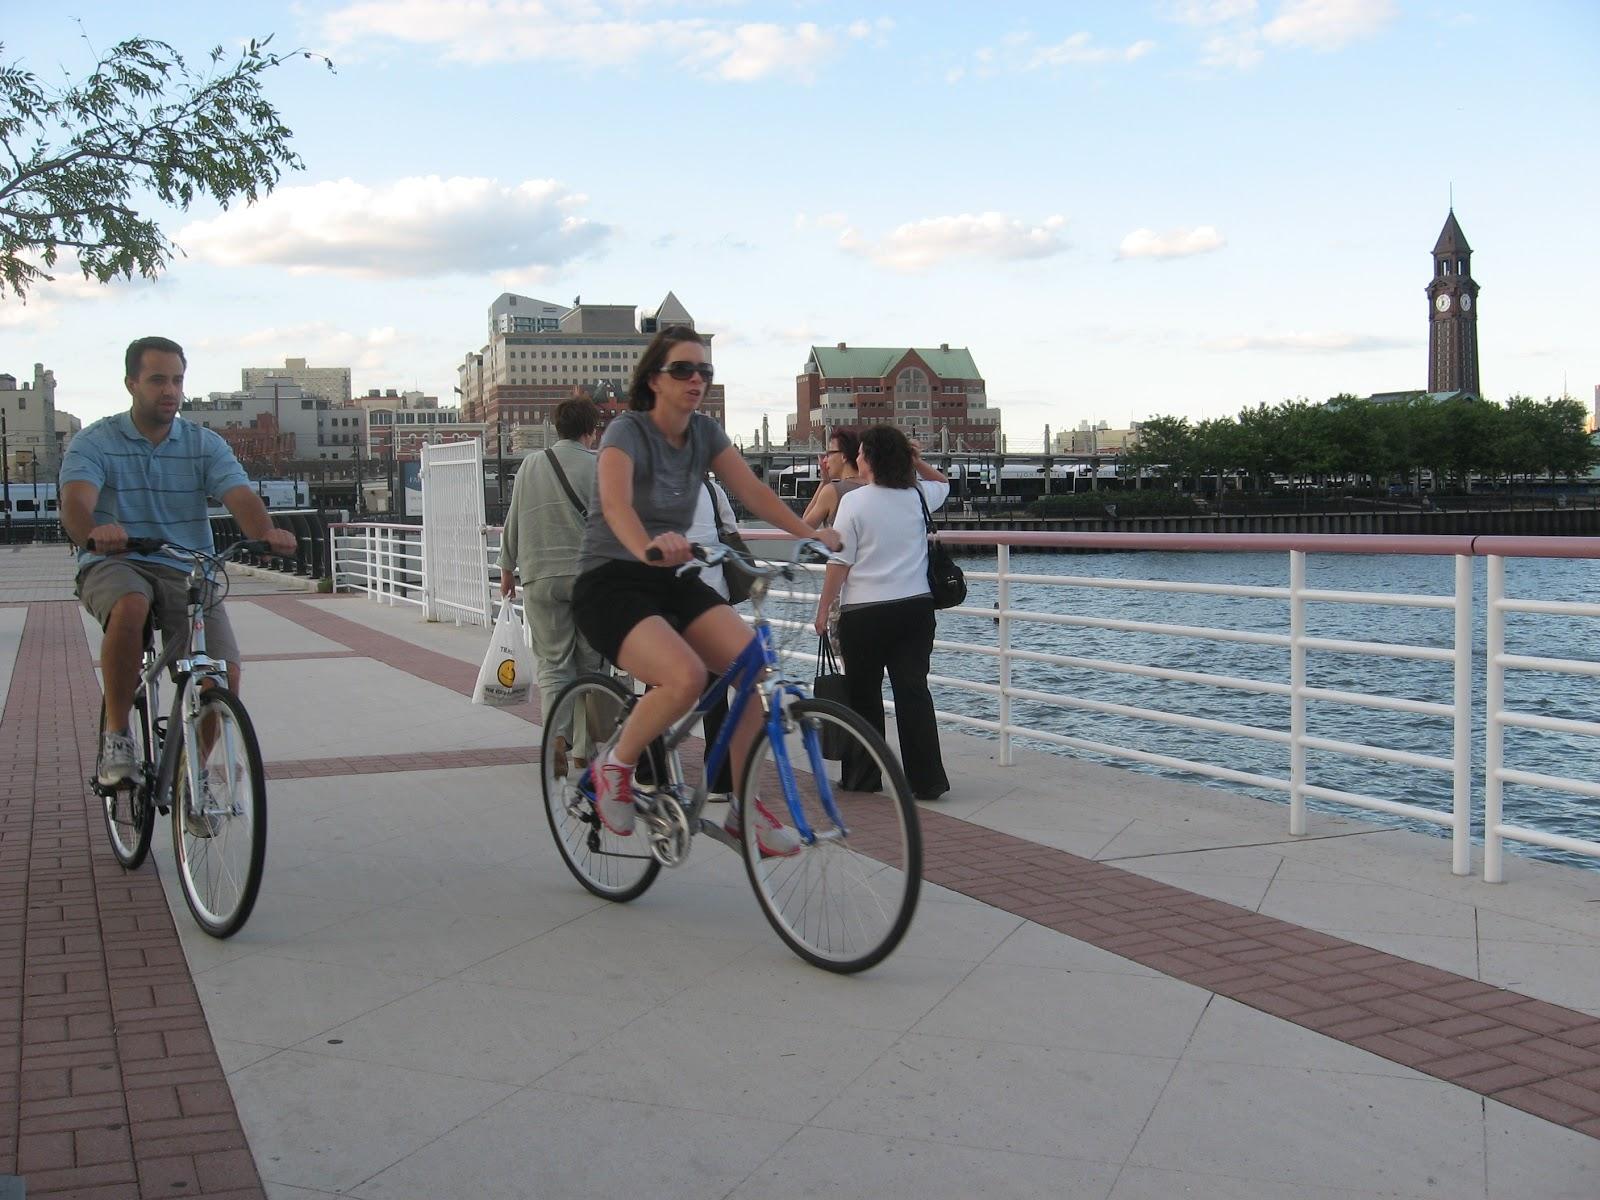 Vision Zero Nj Bike Ped Investments Critical As Hoboken